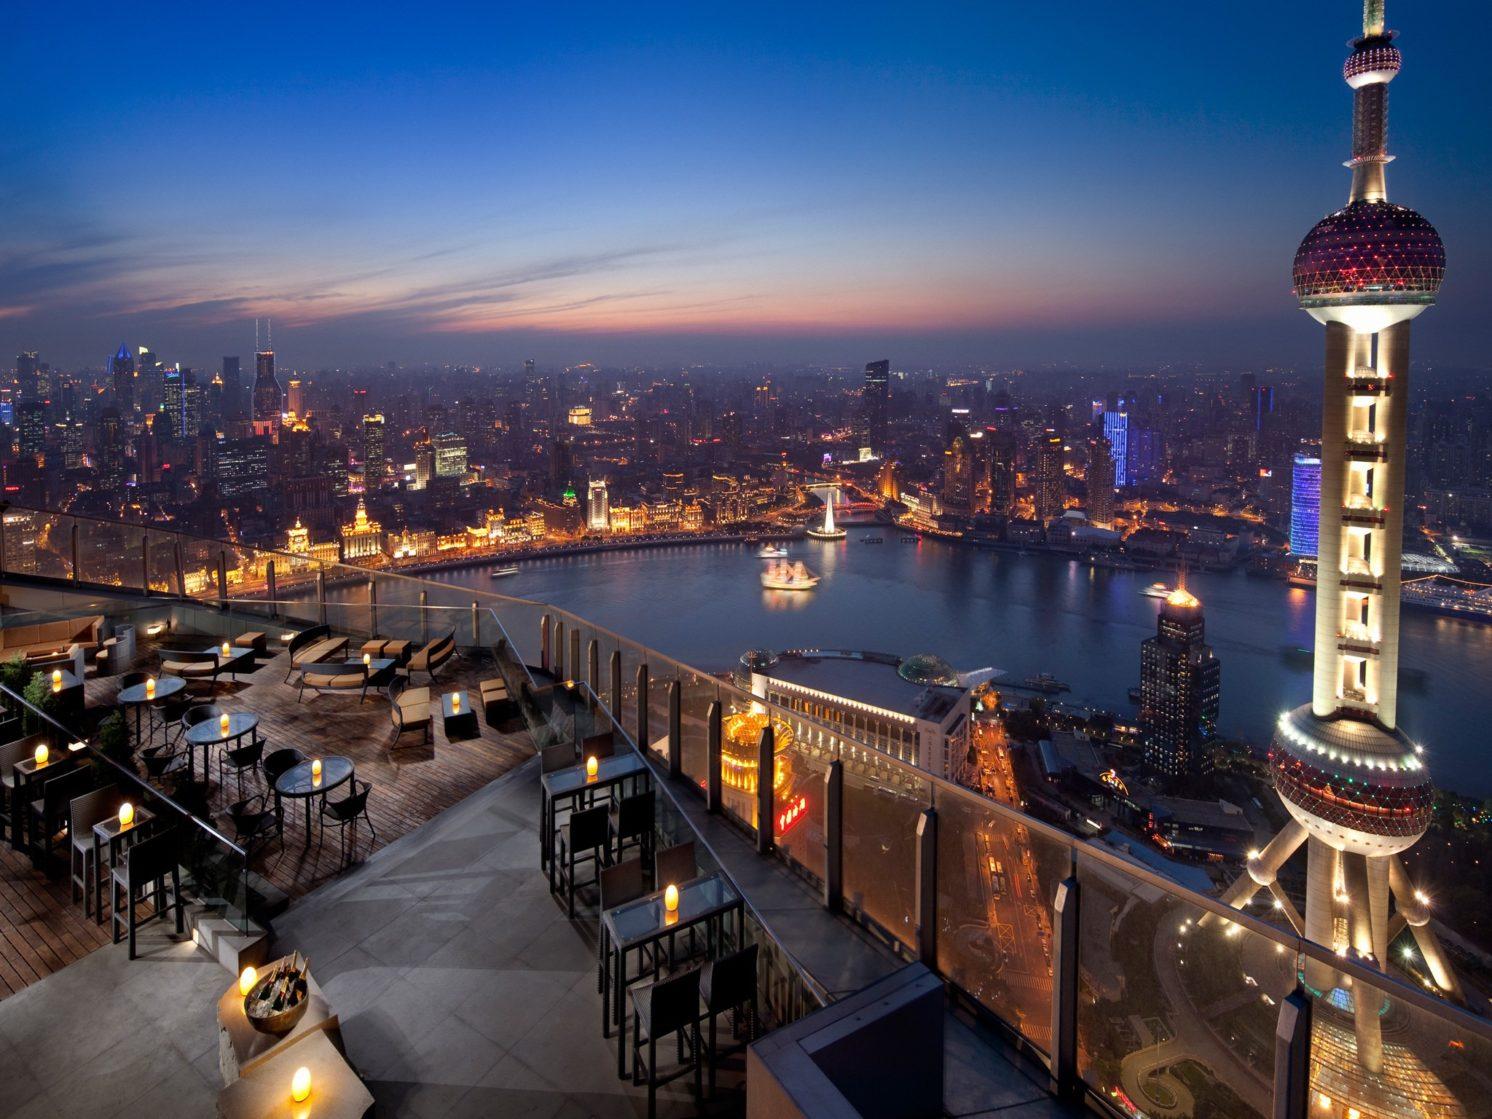 Flair Rooftop Restaurant Bar, hotel Ritz-Carlton, Šanghaj (Čína). Zdroj: Design Hotels